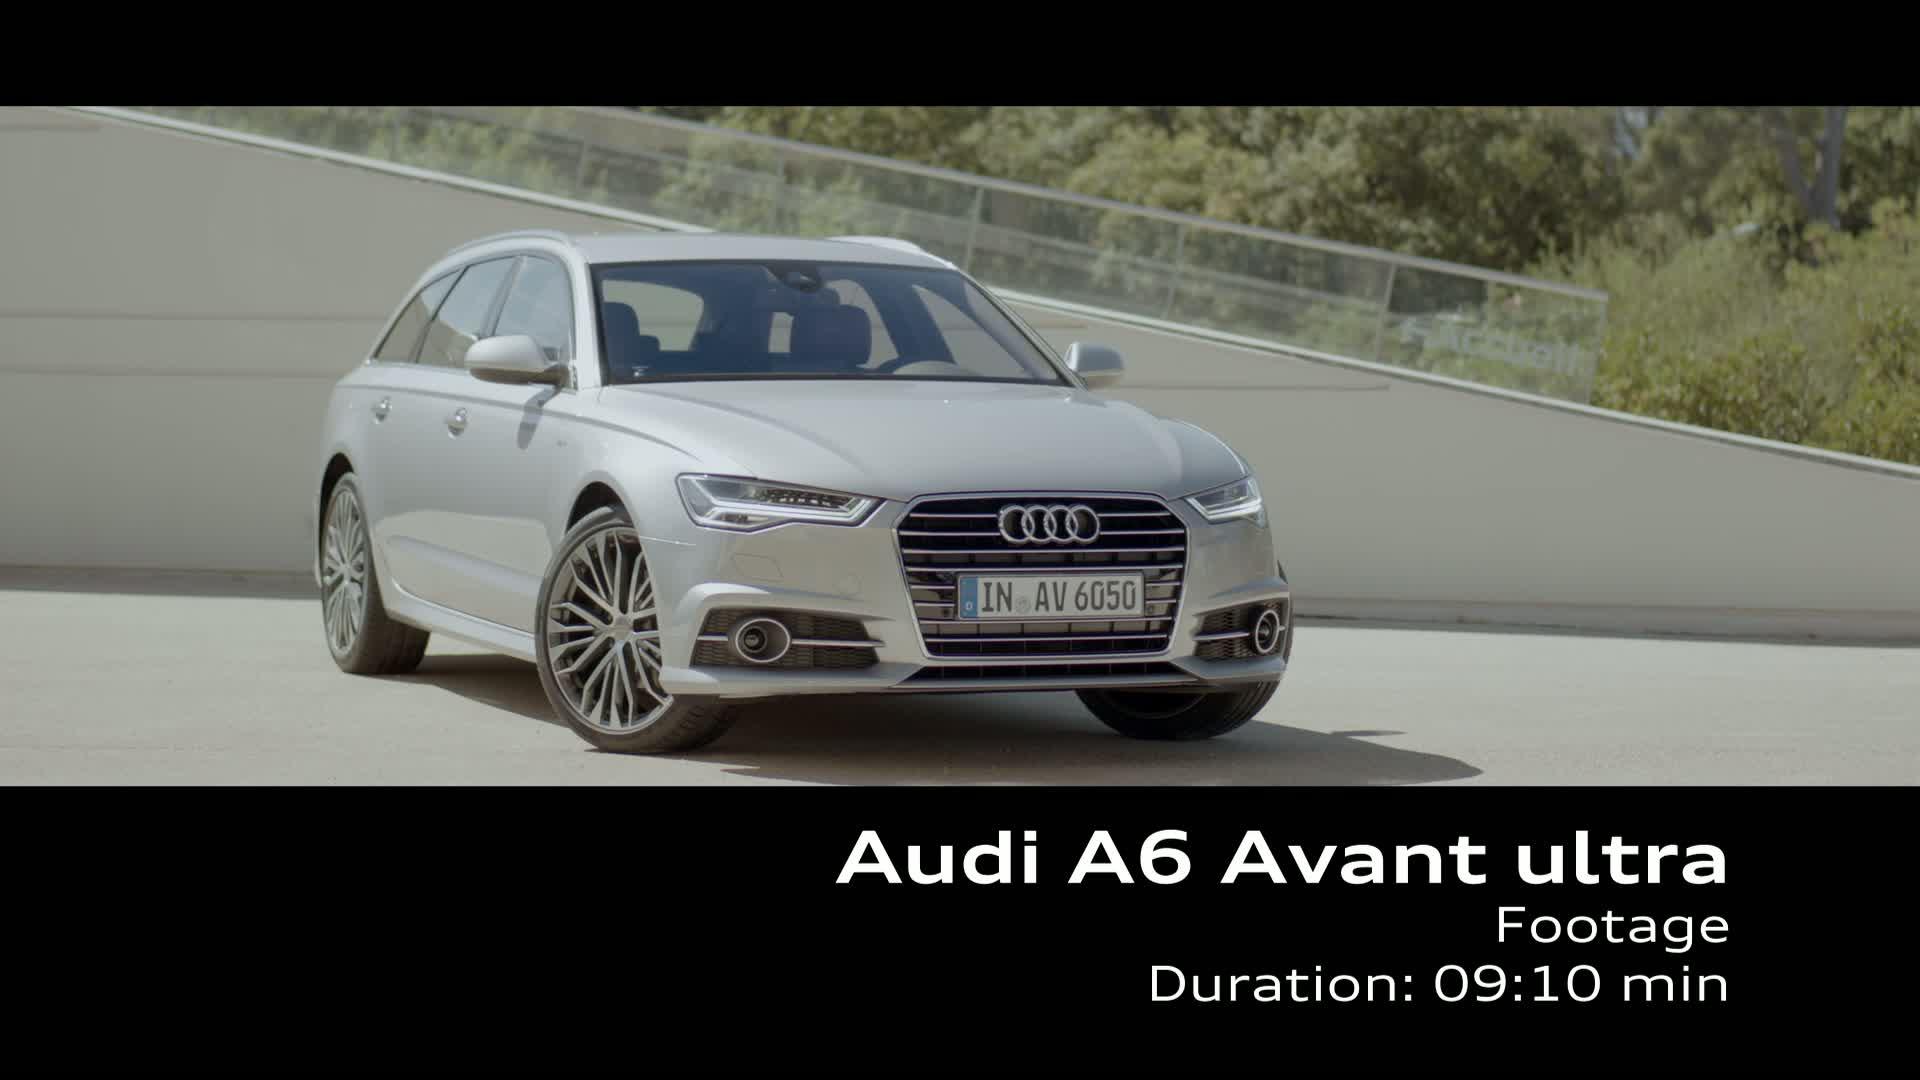 The Audi A6 Avant ultra - Footage